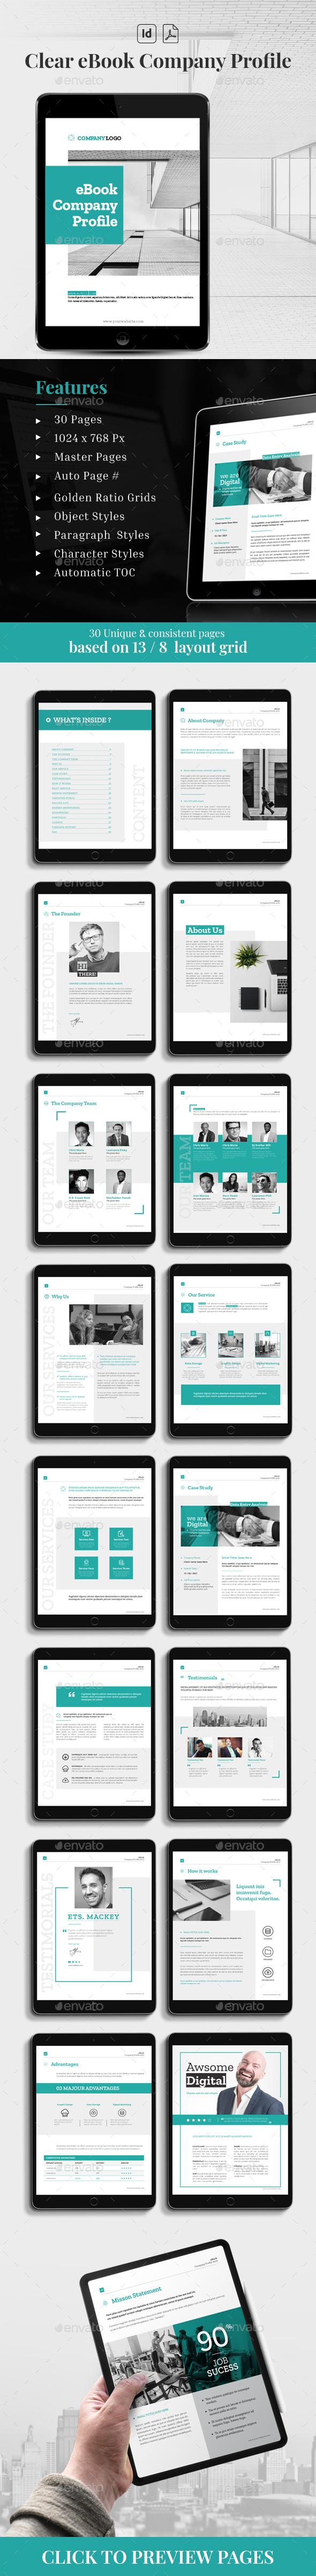 Clear eBook Company Profile